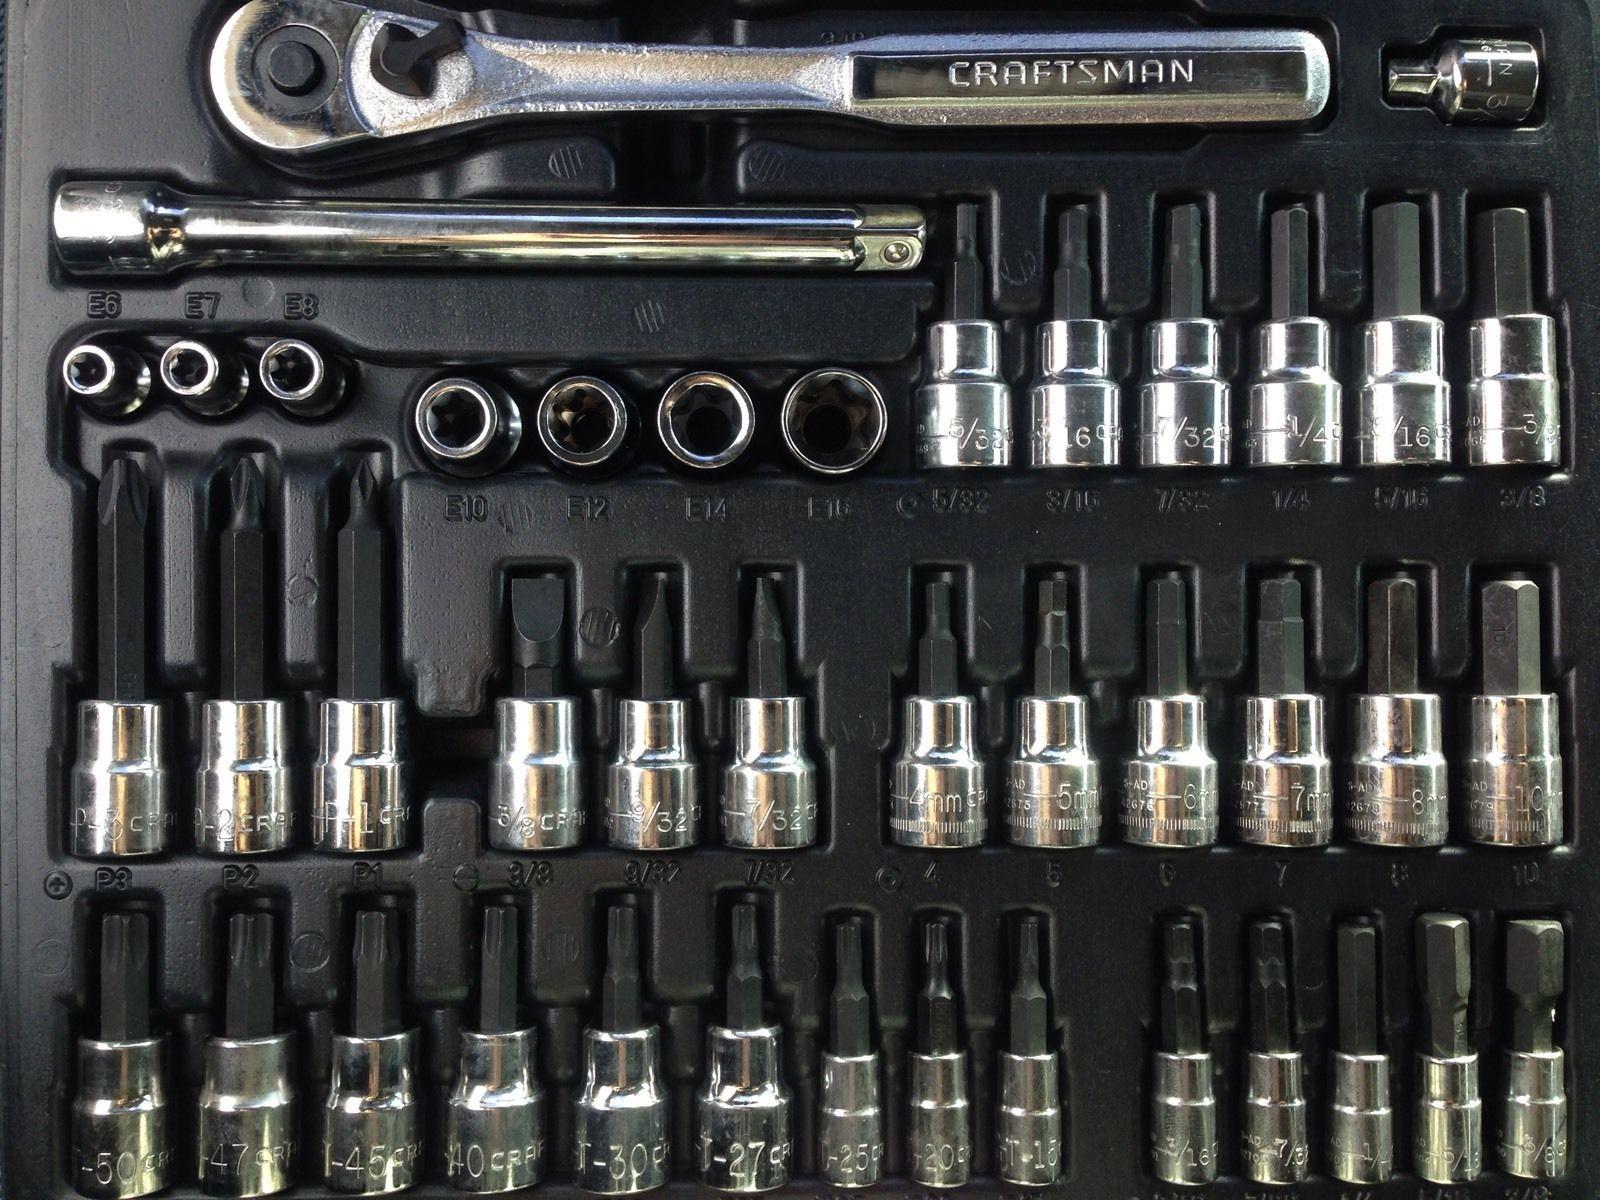 5b95554b203 New Craftsman 42 PC Socket Wrench Set Ratchet Extension Hex Torx Screwdriver